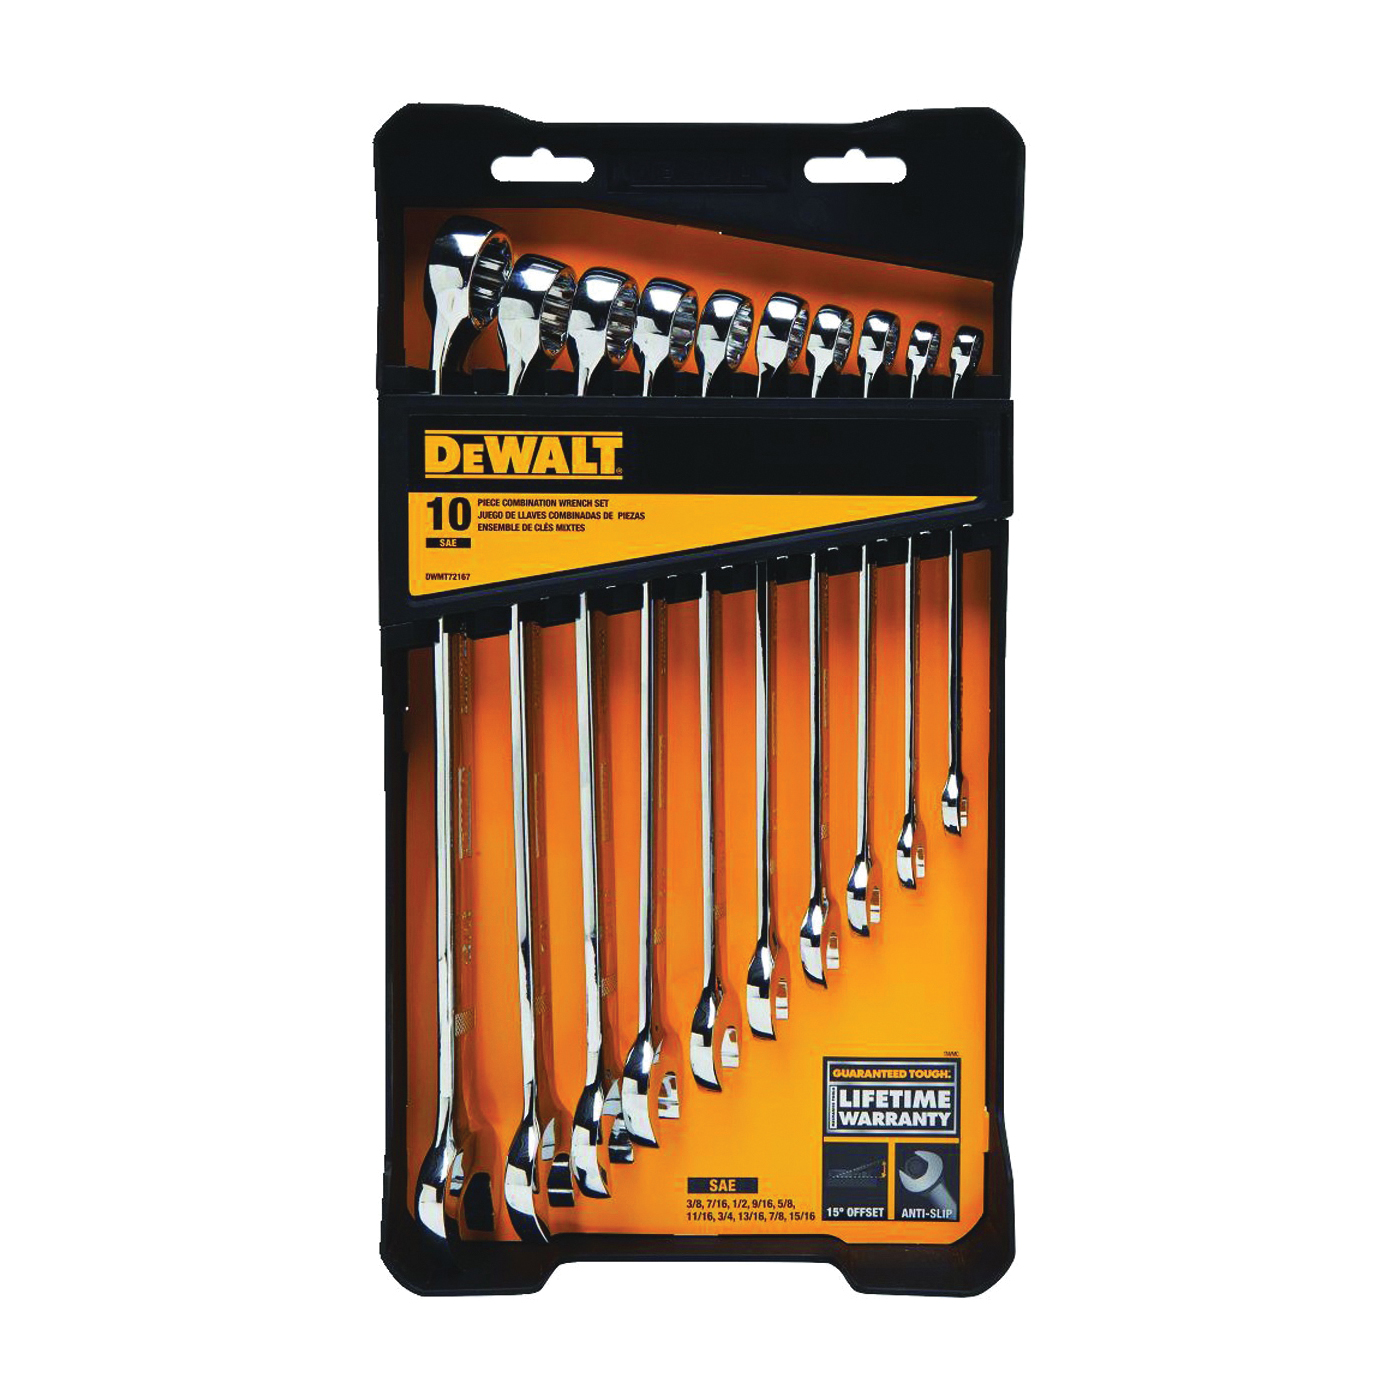 Picture of DeWALT DWMT72167 Wrench Set, 10 -Piece, Chrome Vanadium Steel, Specifications: SAE Measurement